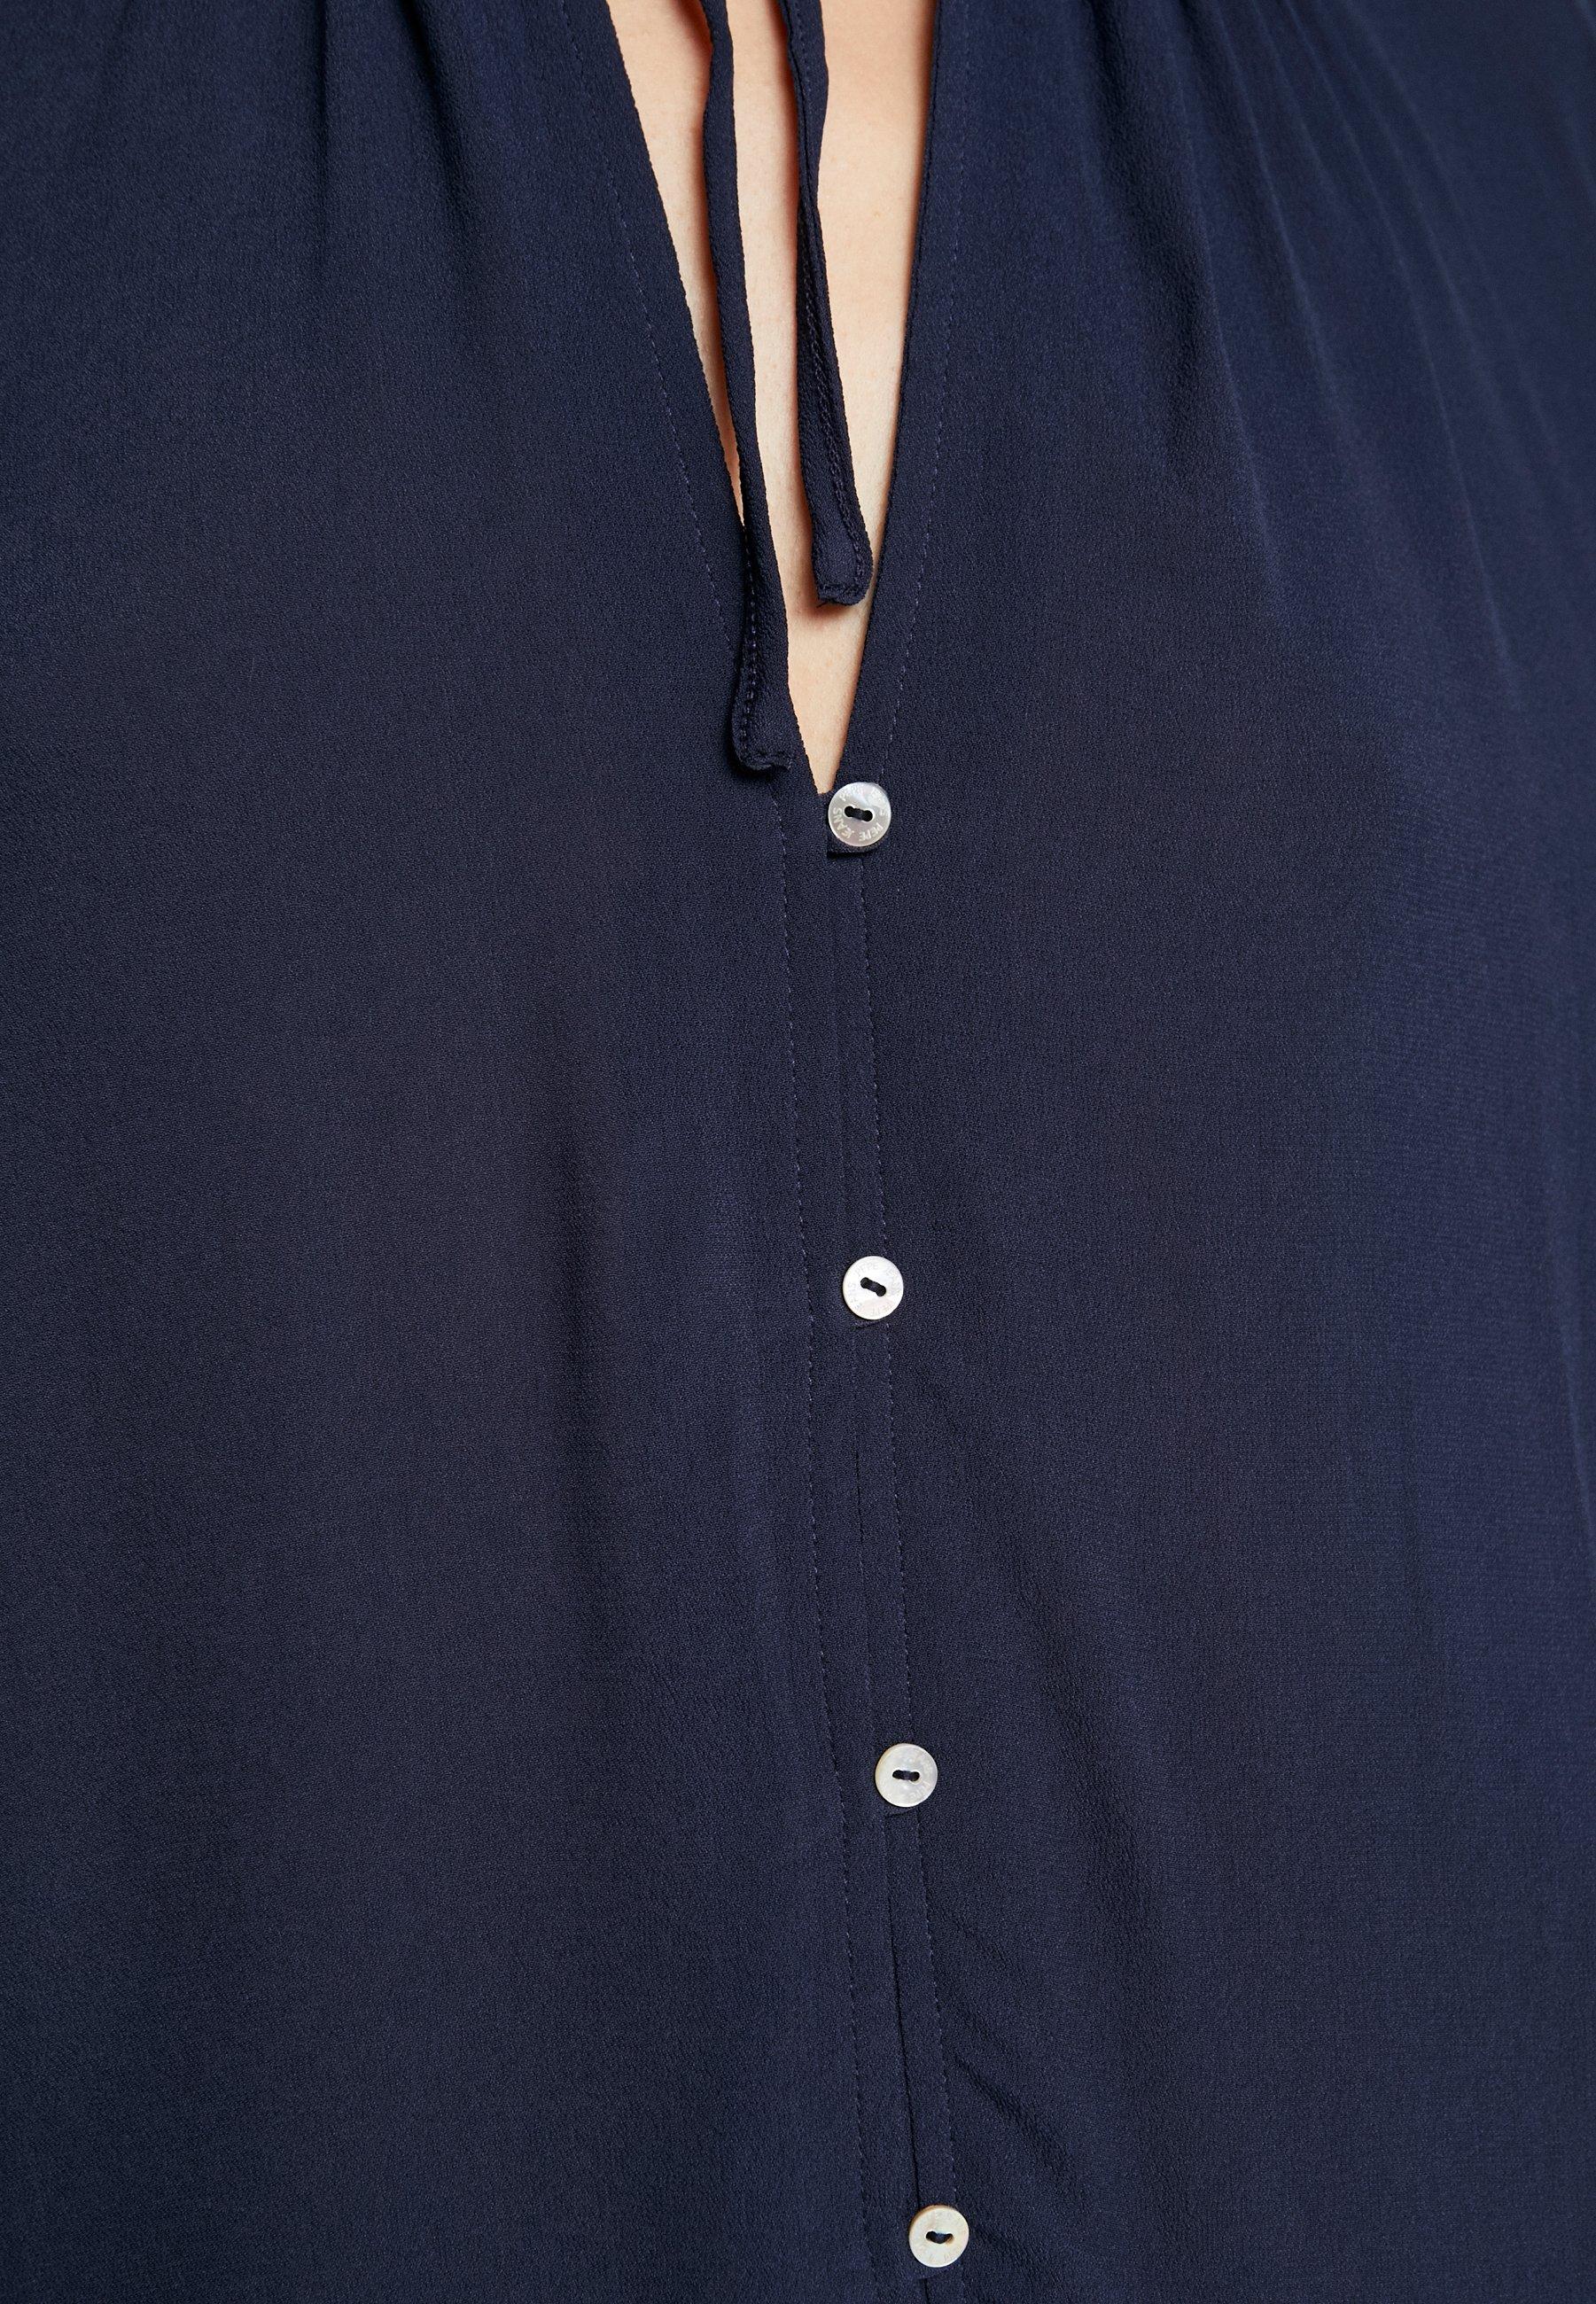 Pepe Jeans MARGA - Blouse - chatham blue 4G058